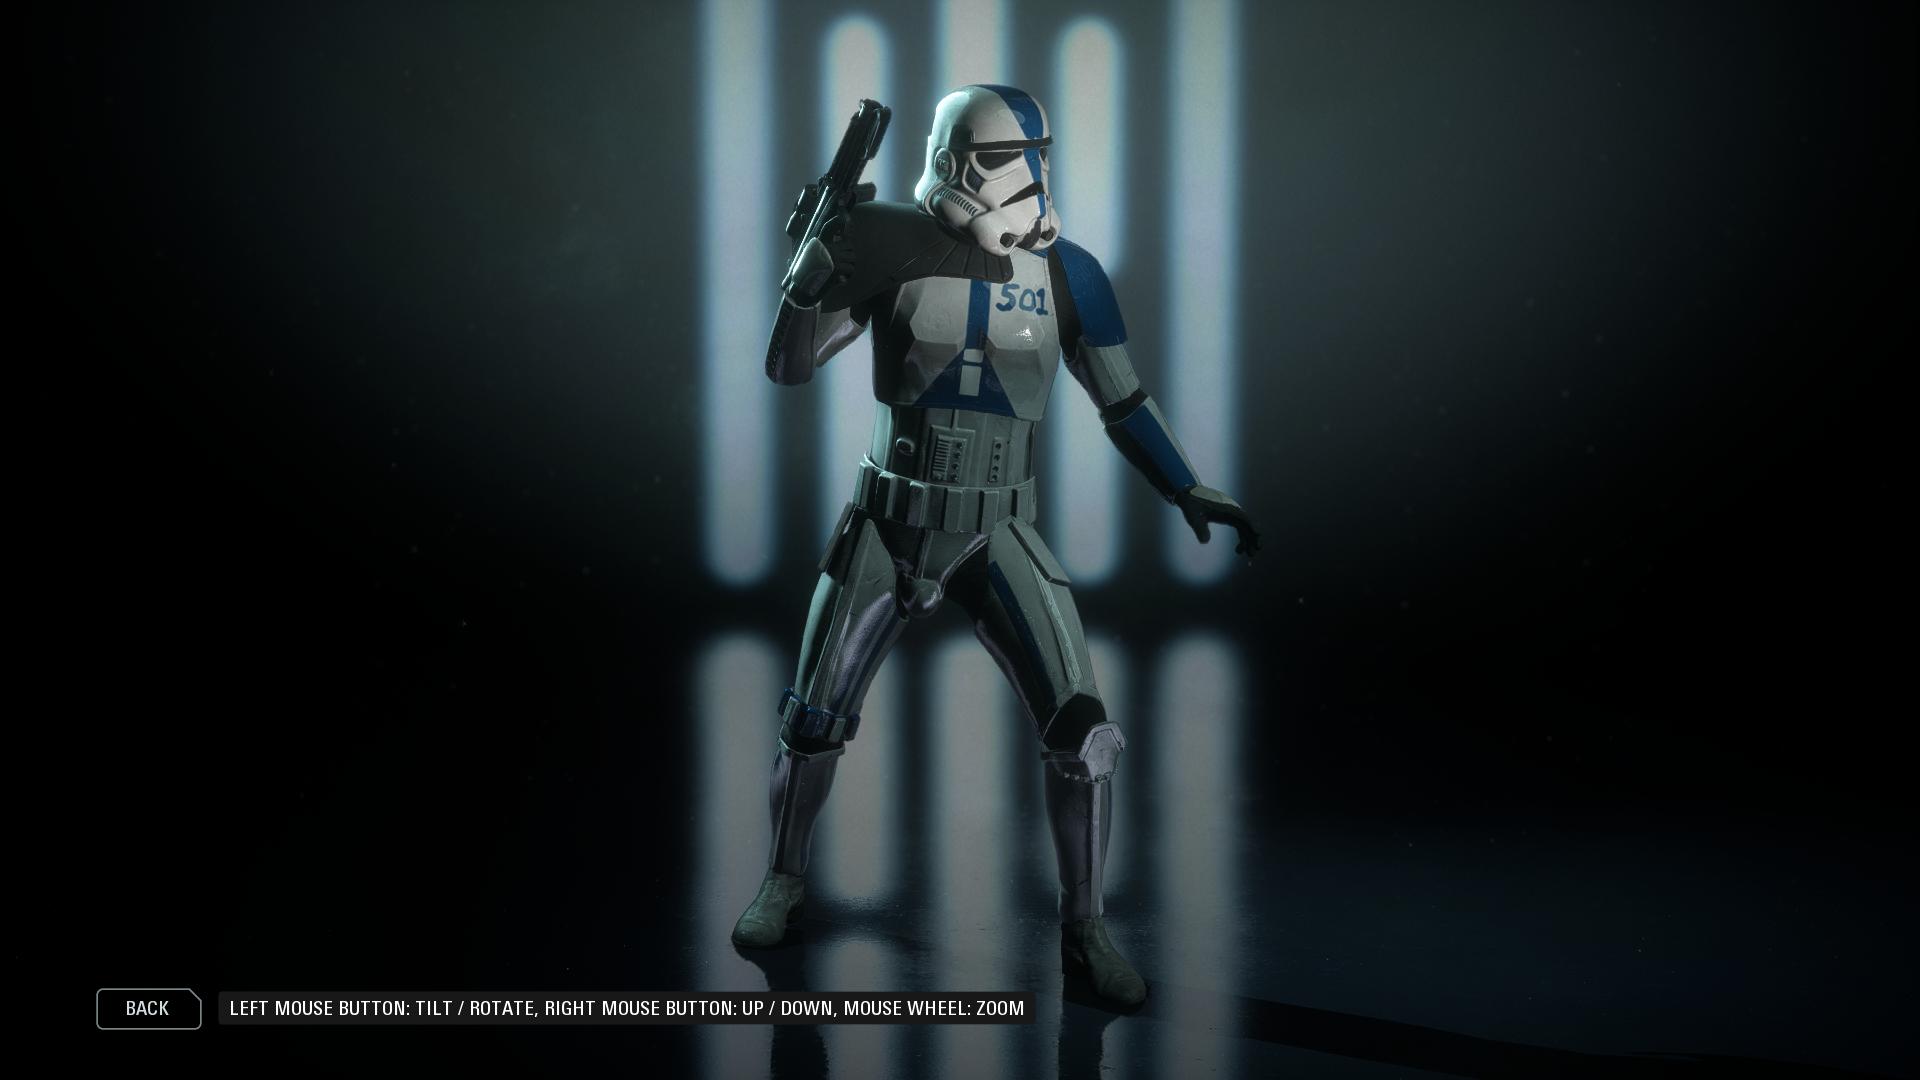 501st Stormtrooper At Star Wars Battlefront Ii 2017 Nexus Mods And Community Stormtrooper Star Wars Artwork Star Wars Trooper